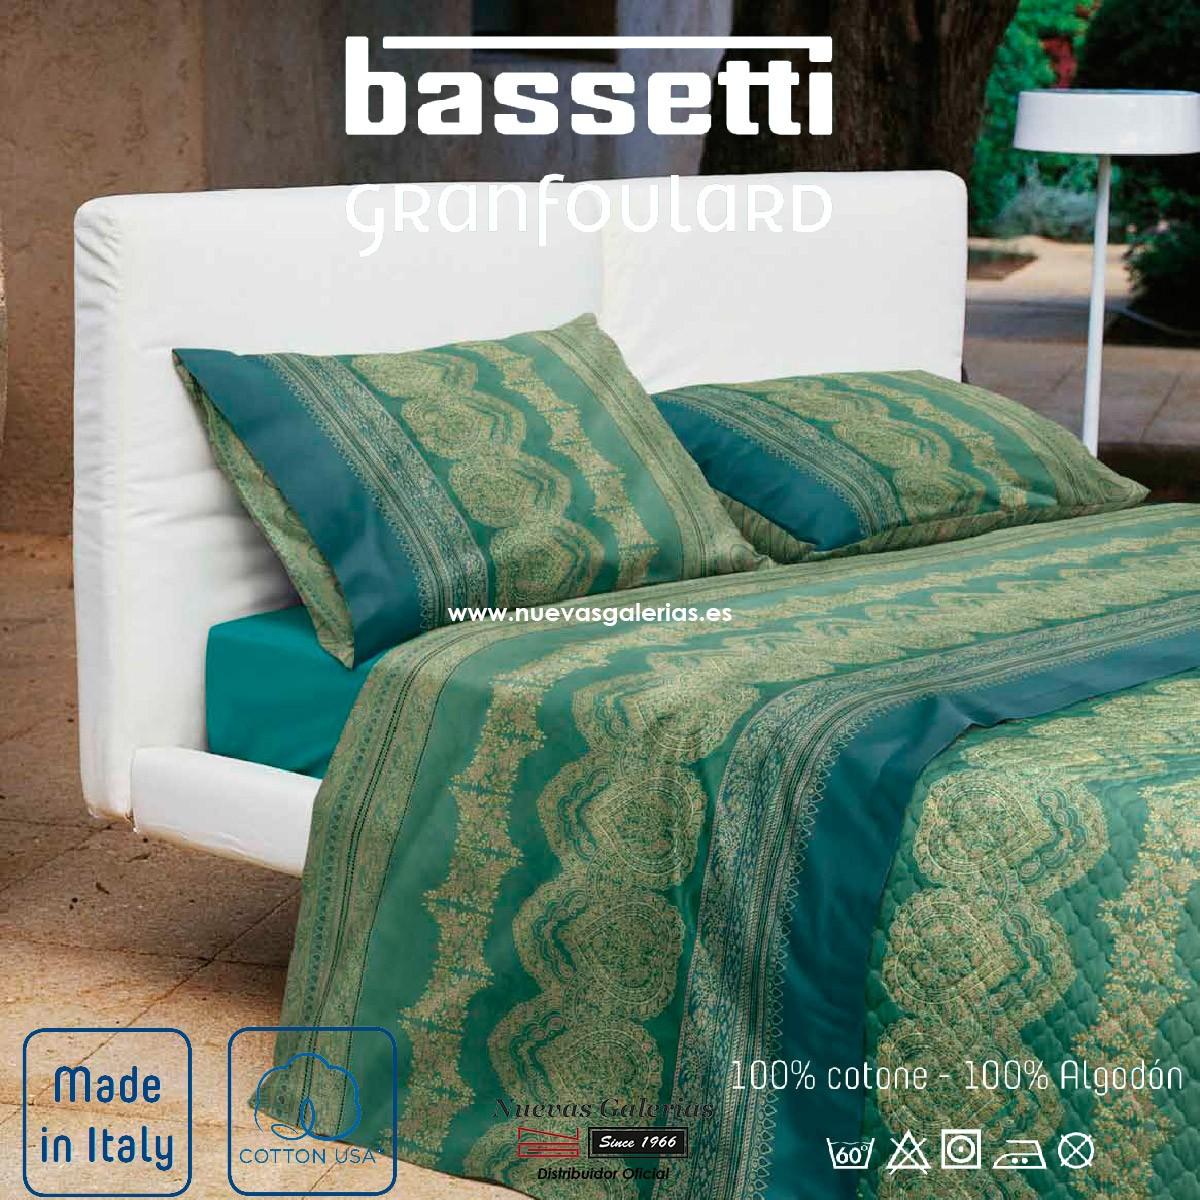 Sommerbettwäsche Bassetti Brunelleschi Grün V4 Granfoulard Nue